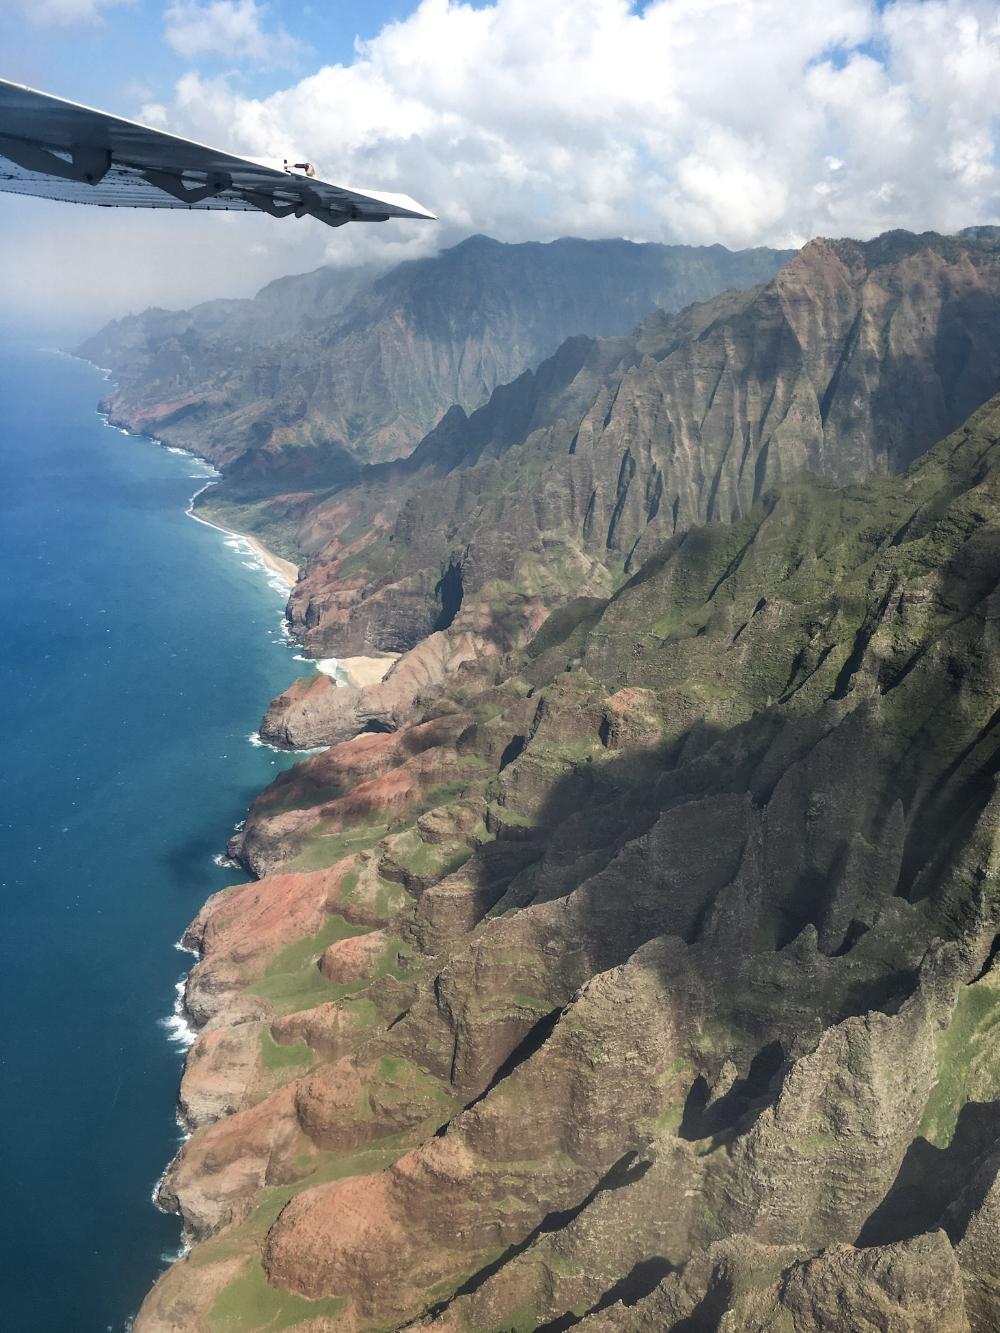 curio.trips.hawaii.kauai.coast.1.jpg